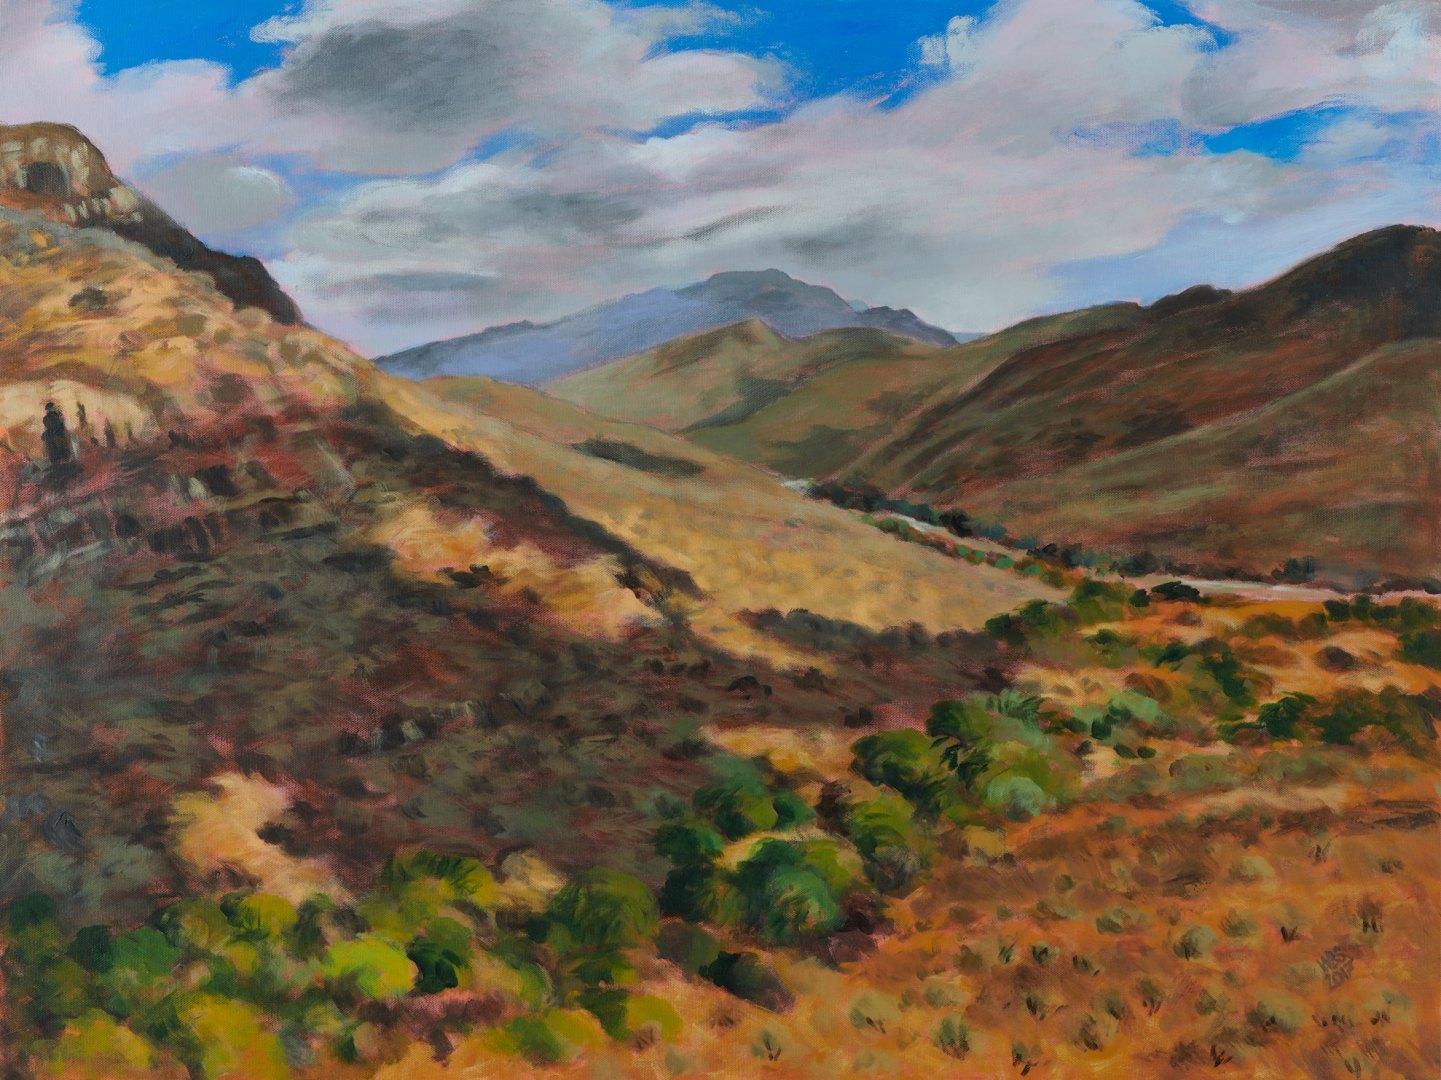 Painting looking west towards Manoutsa, acrylic on canvas